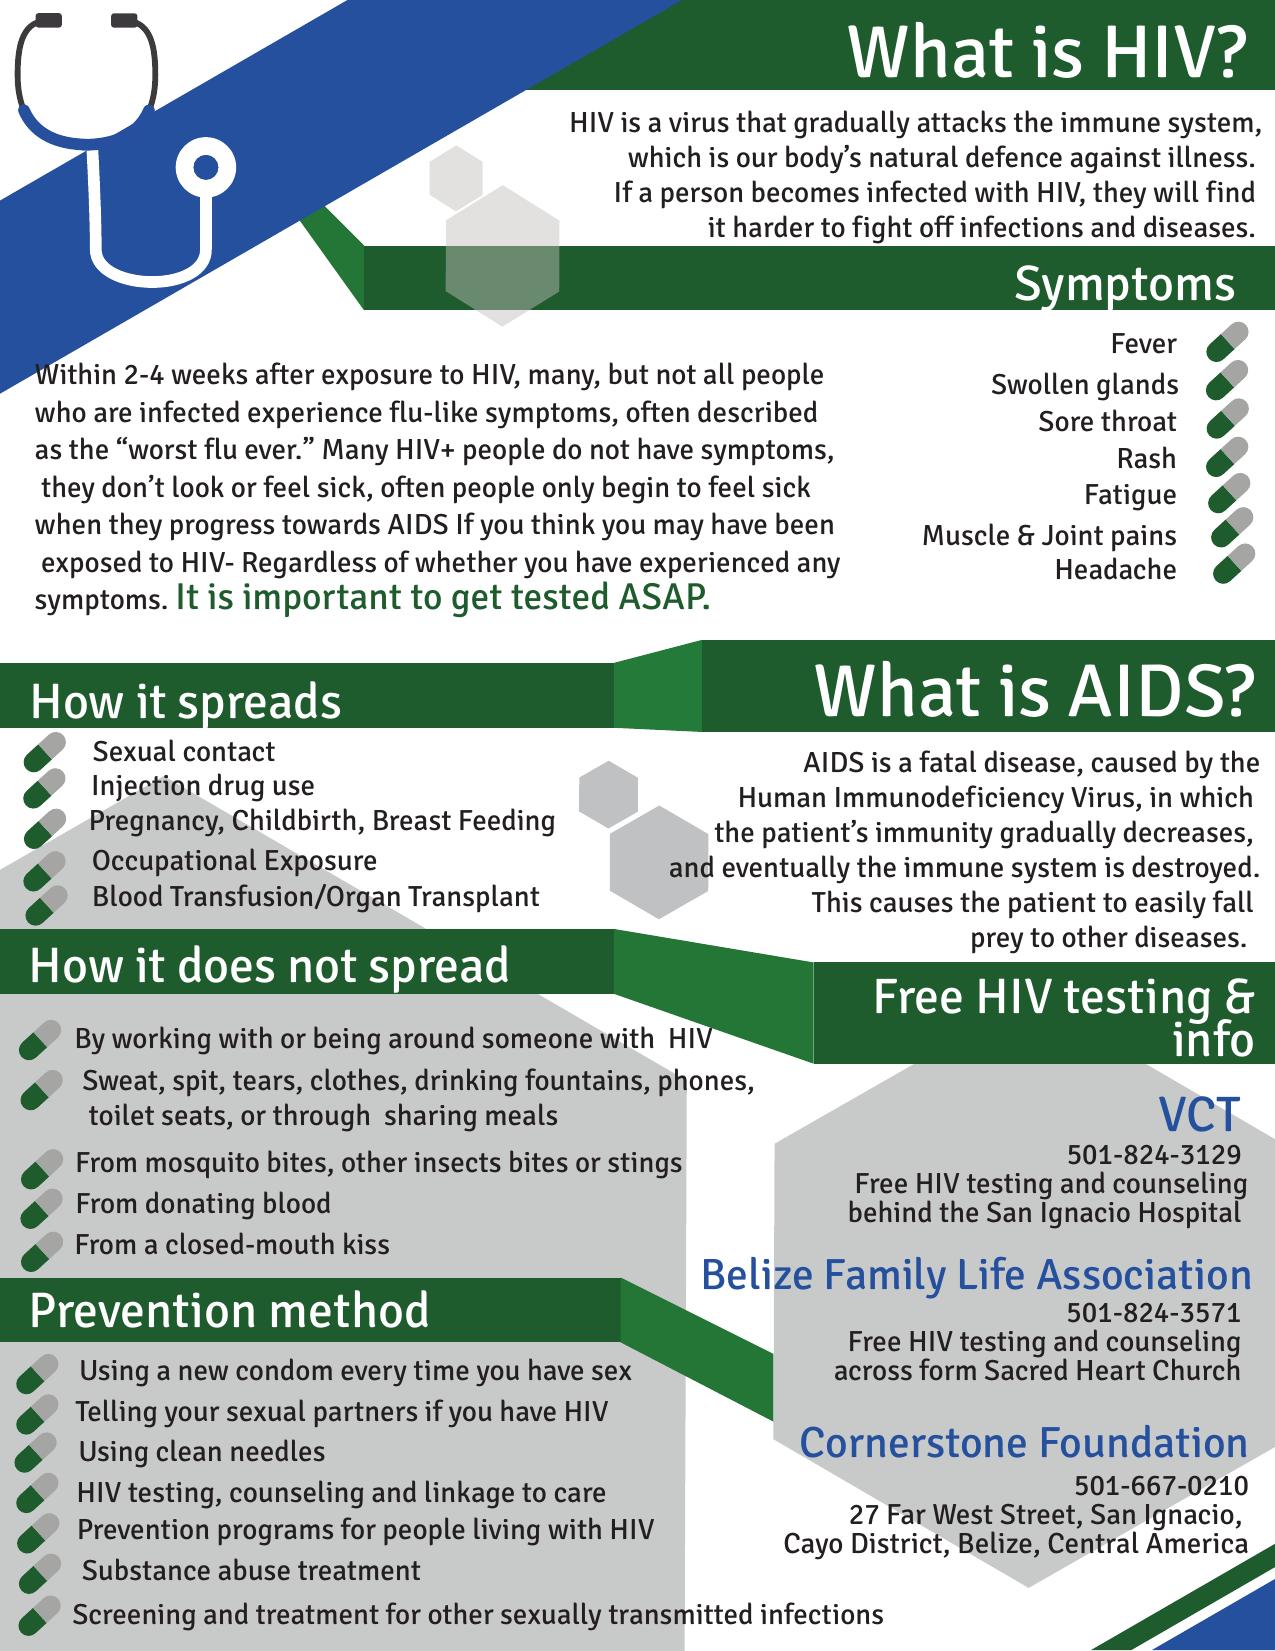 AIDS/HIV Fact Sheet - Cornerstone Foundation Belize